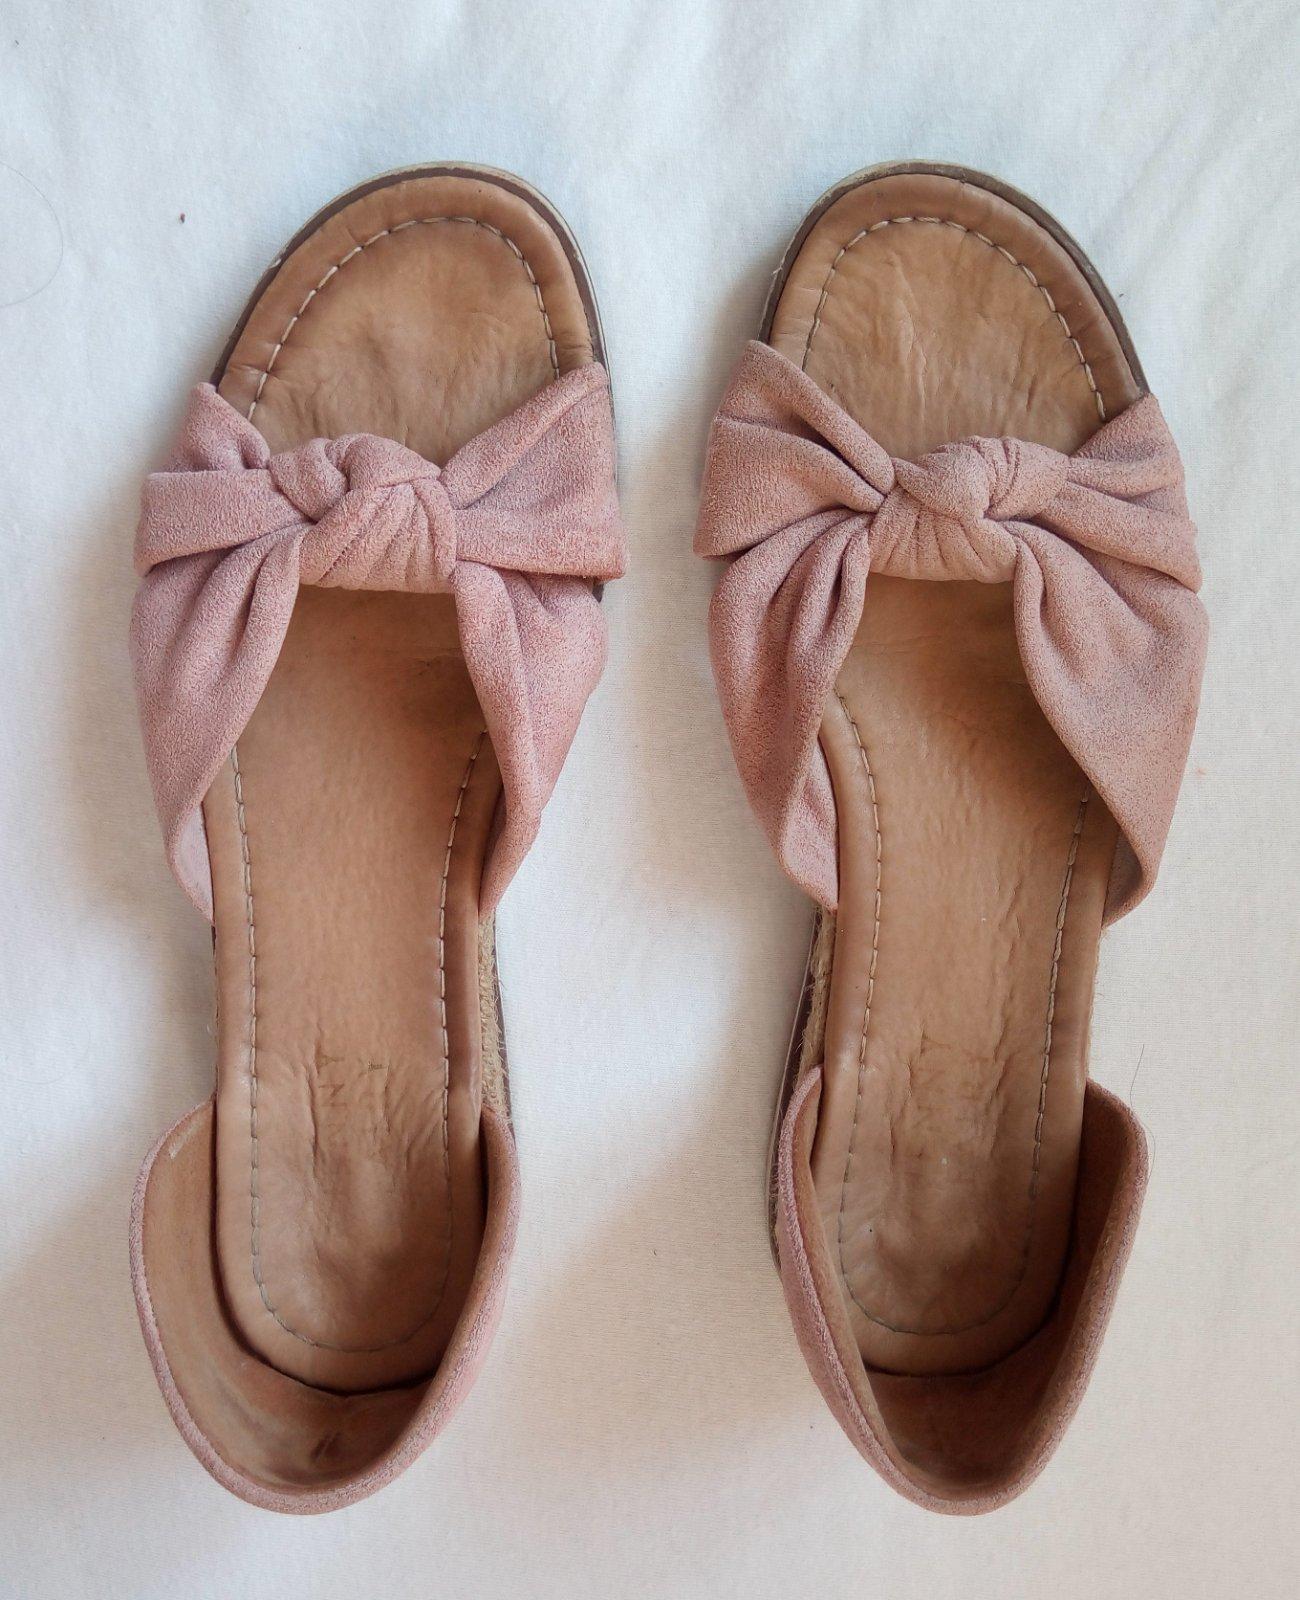 Bledoružové sandálky 38 - Obrázok č. 3